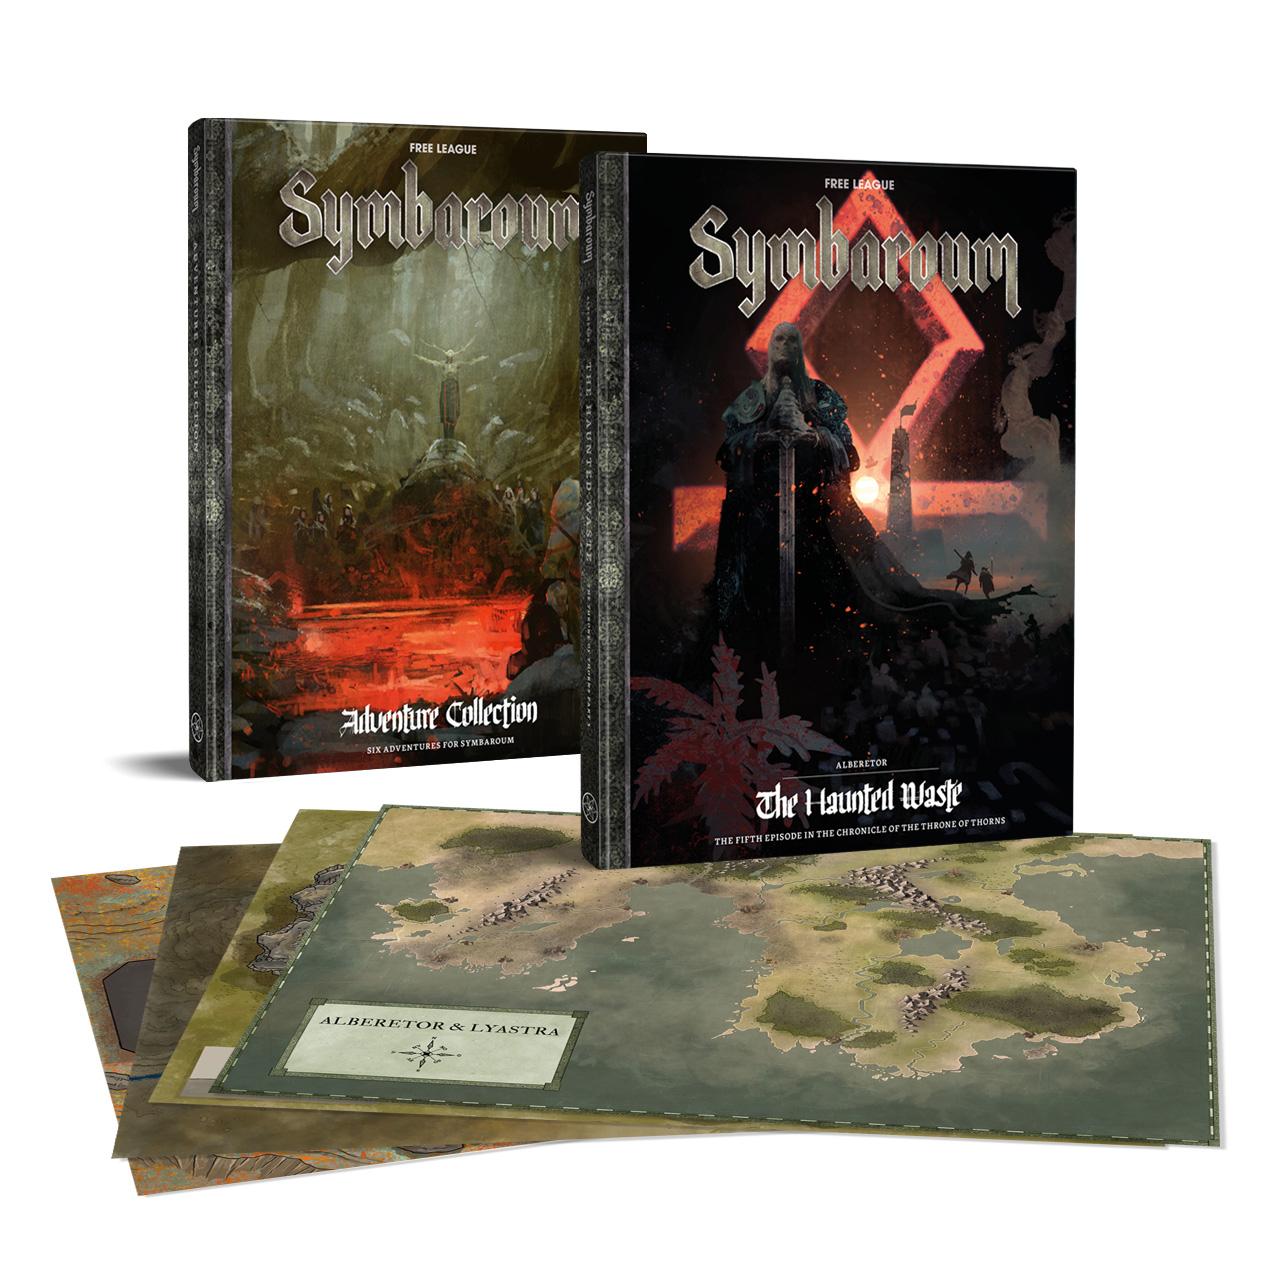 Symbaroum Alberetor The Haunted Waste_preorder_bundle